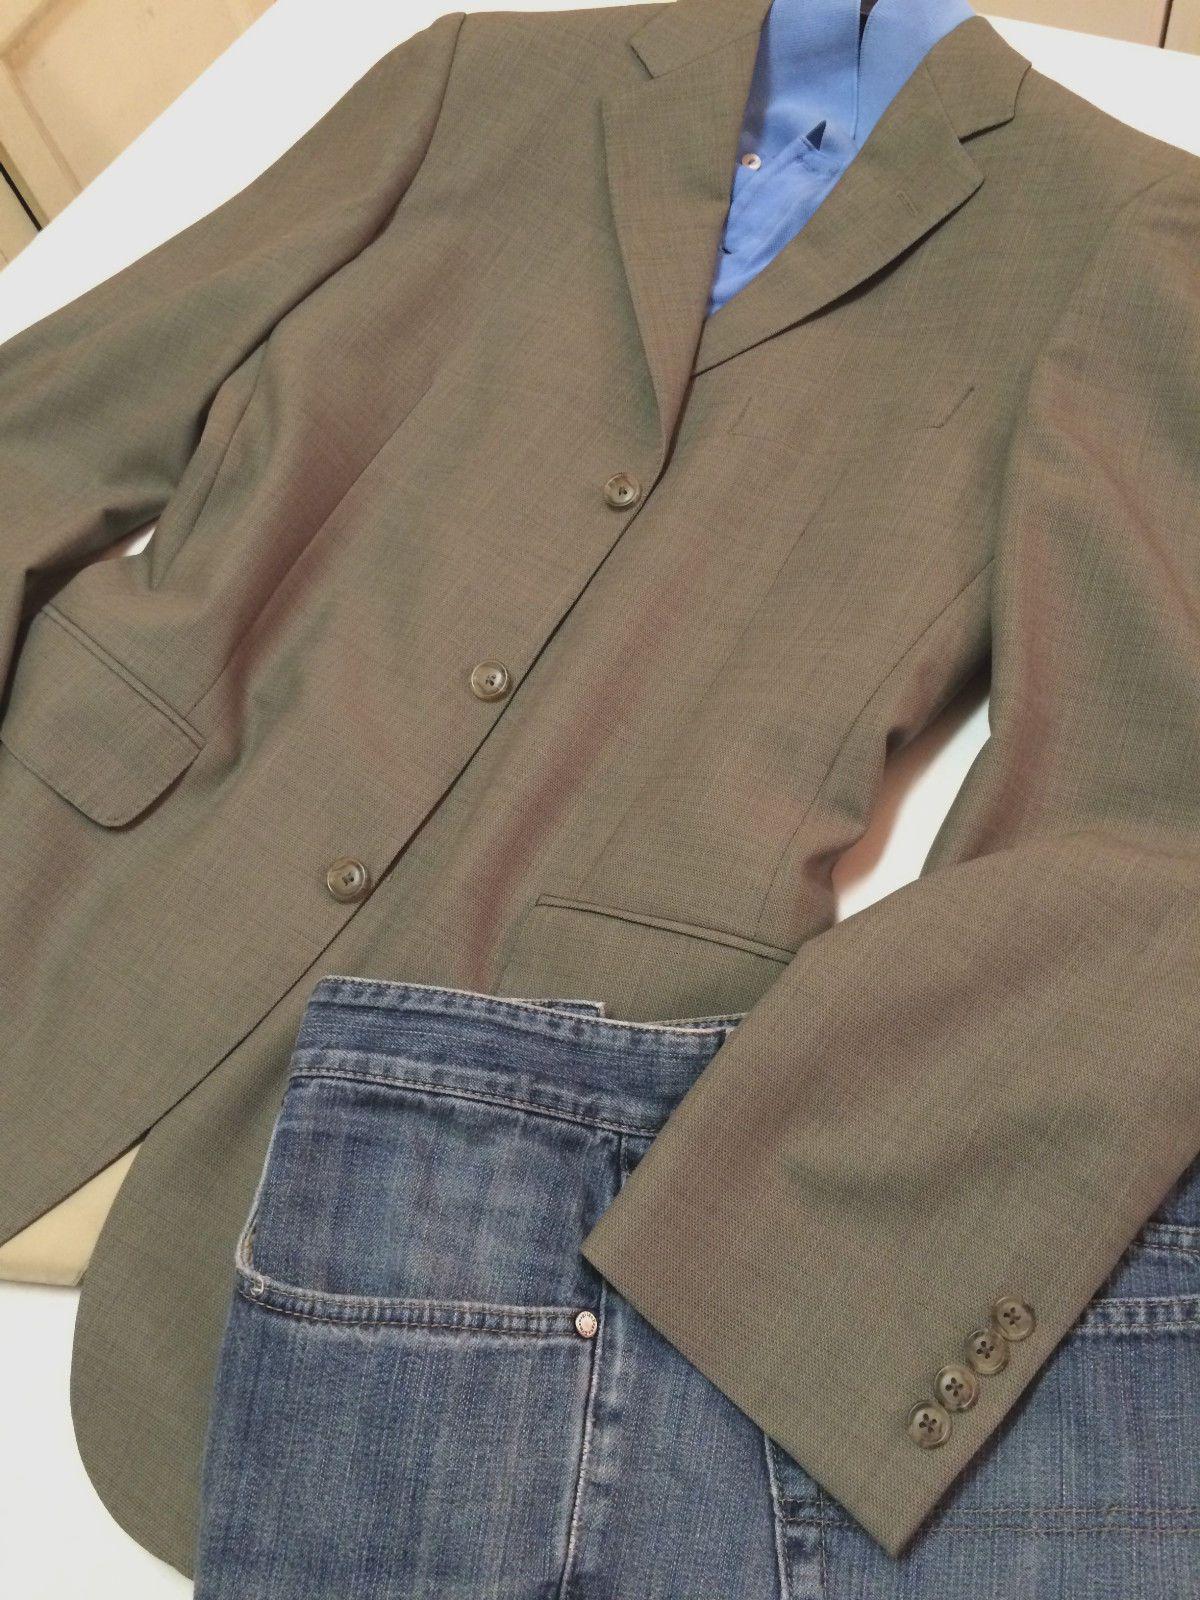 Samuelsohn Mens Sport Coat Jacket Blazer 40L Pale Green Italian Cloth 3 Button | eBay